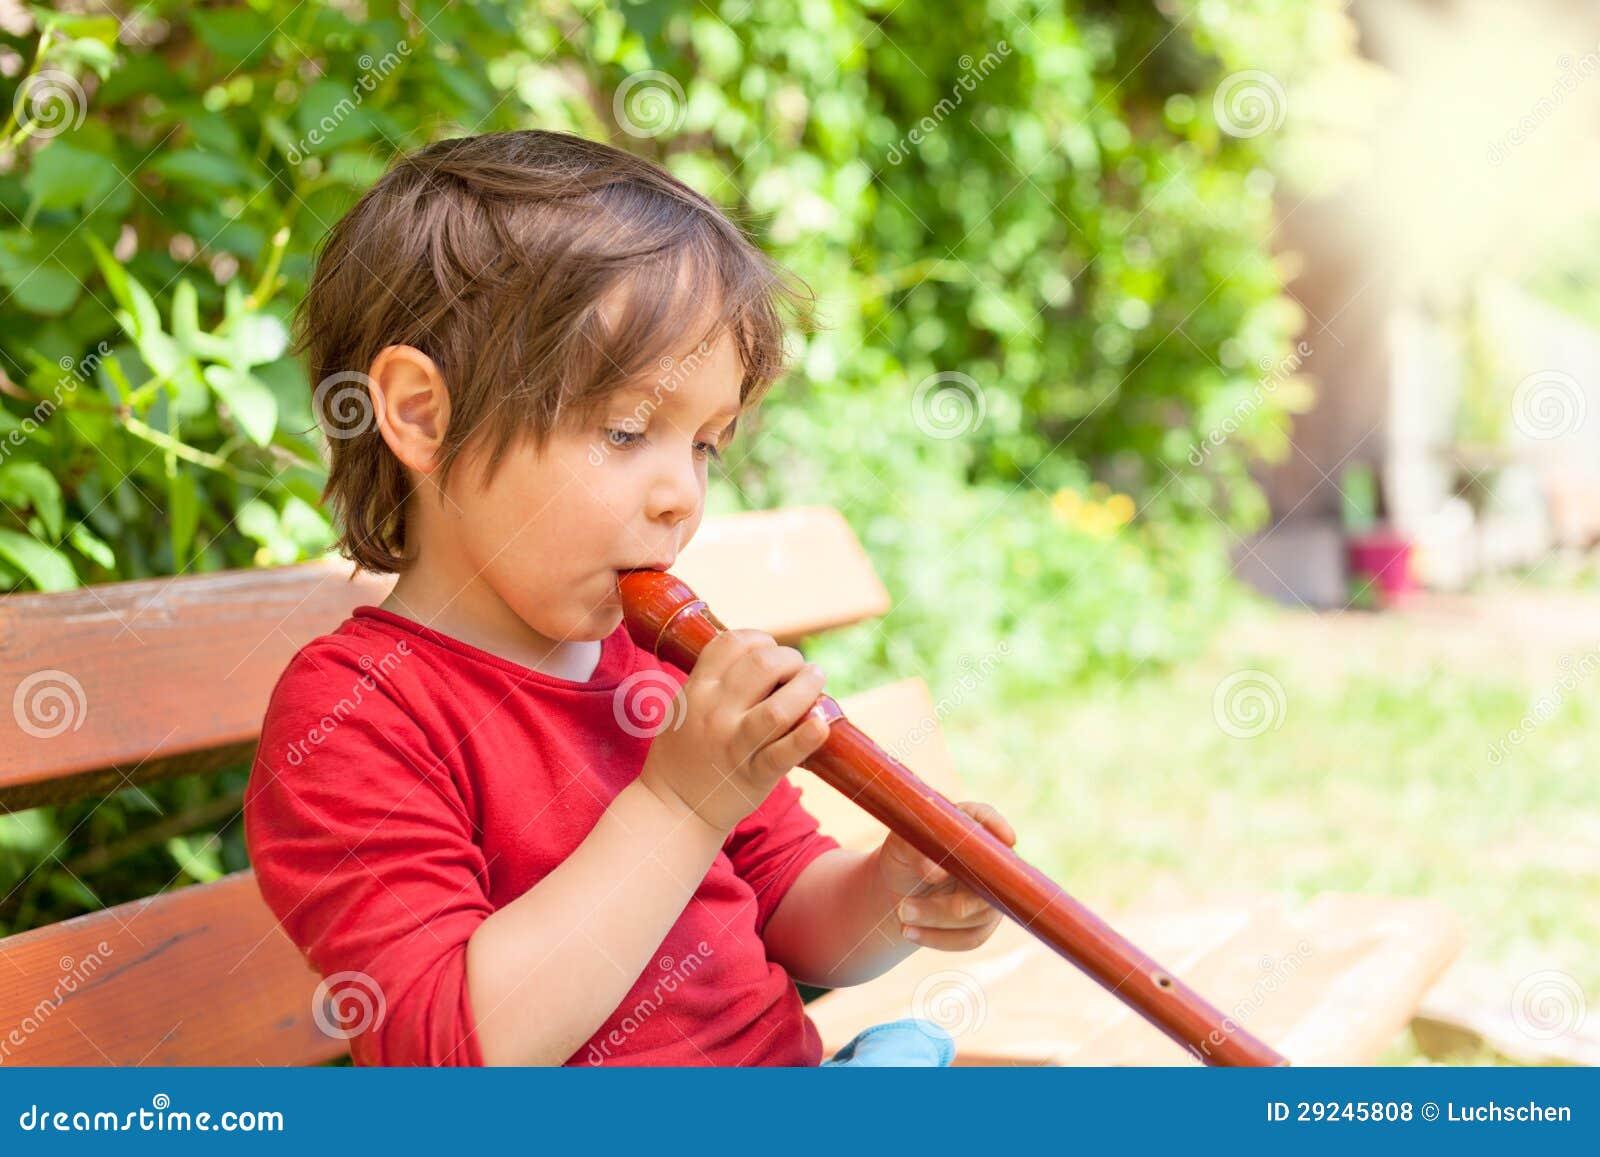 Download Flauta de madeira foto de stock. Imagem de família, flauta - 29245808